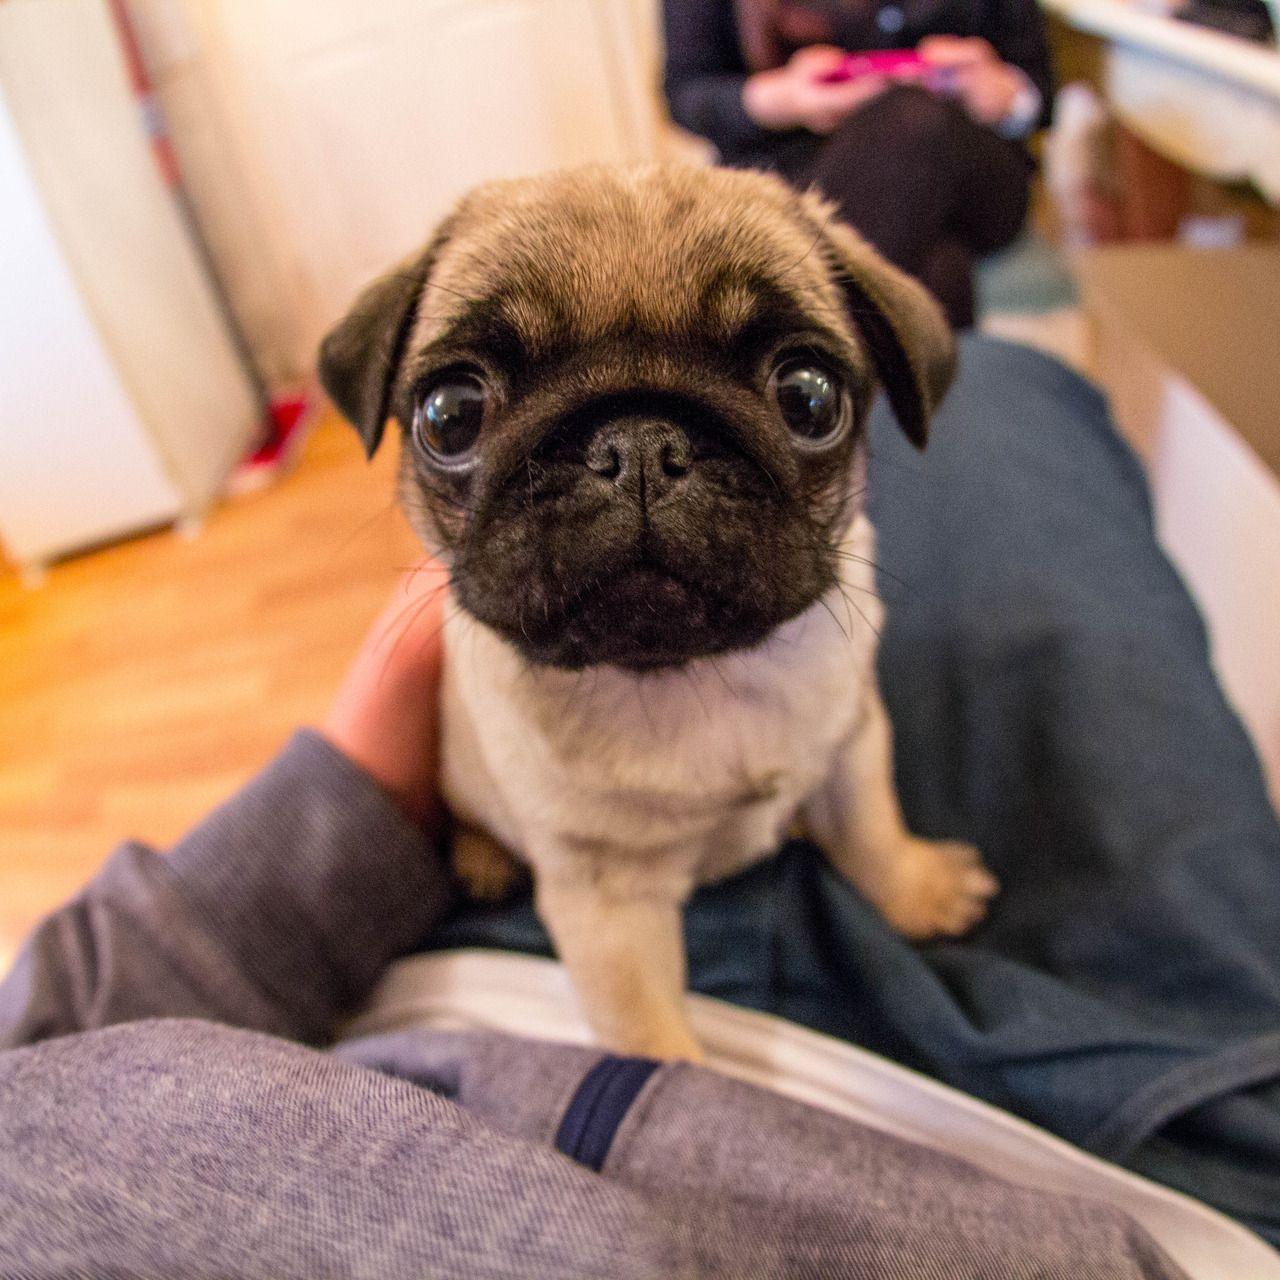 Do You Love Me Pug Z Mad Stuff Baby Pug Dog Baby Pugs Pugs